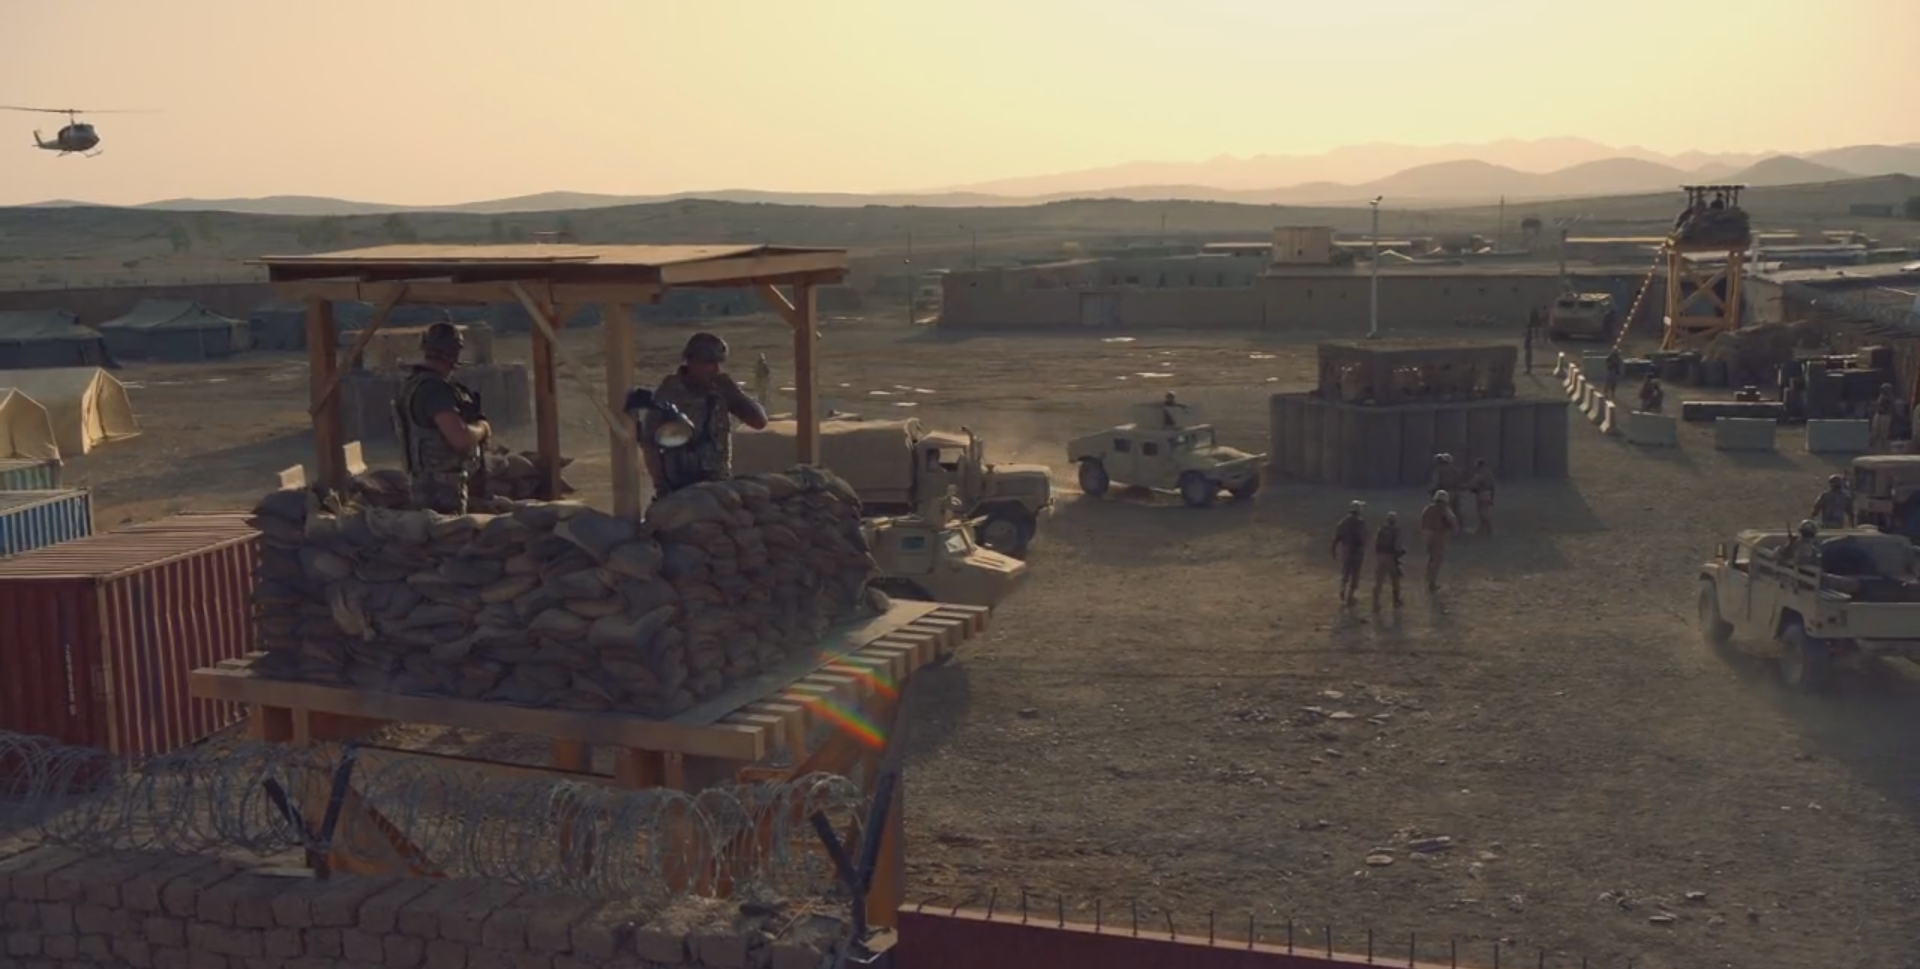 Les FAR et le Cinema / Moroccan Armed Forces in Movies - Page 10 Sans_t28